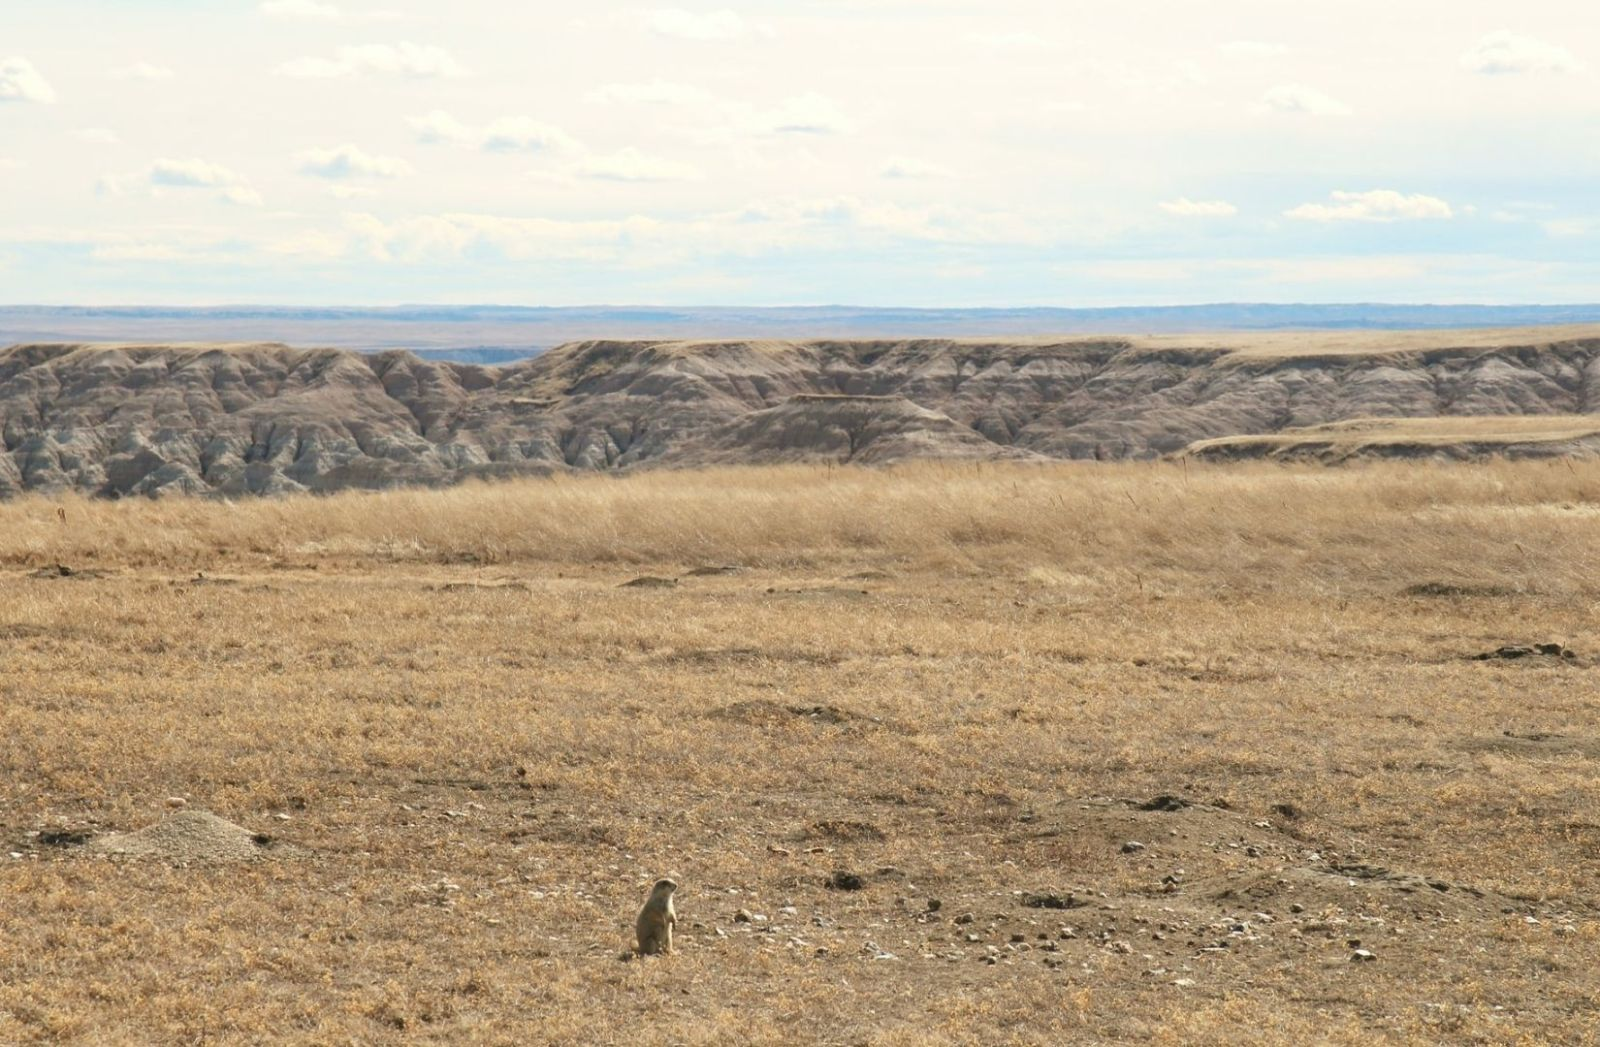 Armut herrscht im Reservat in South Dakota. (Foto: Sophia Simoes, Unsplash.com)